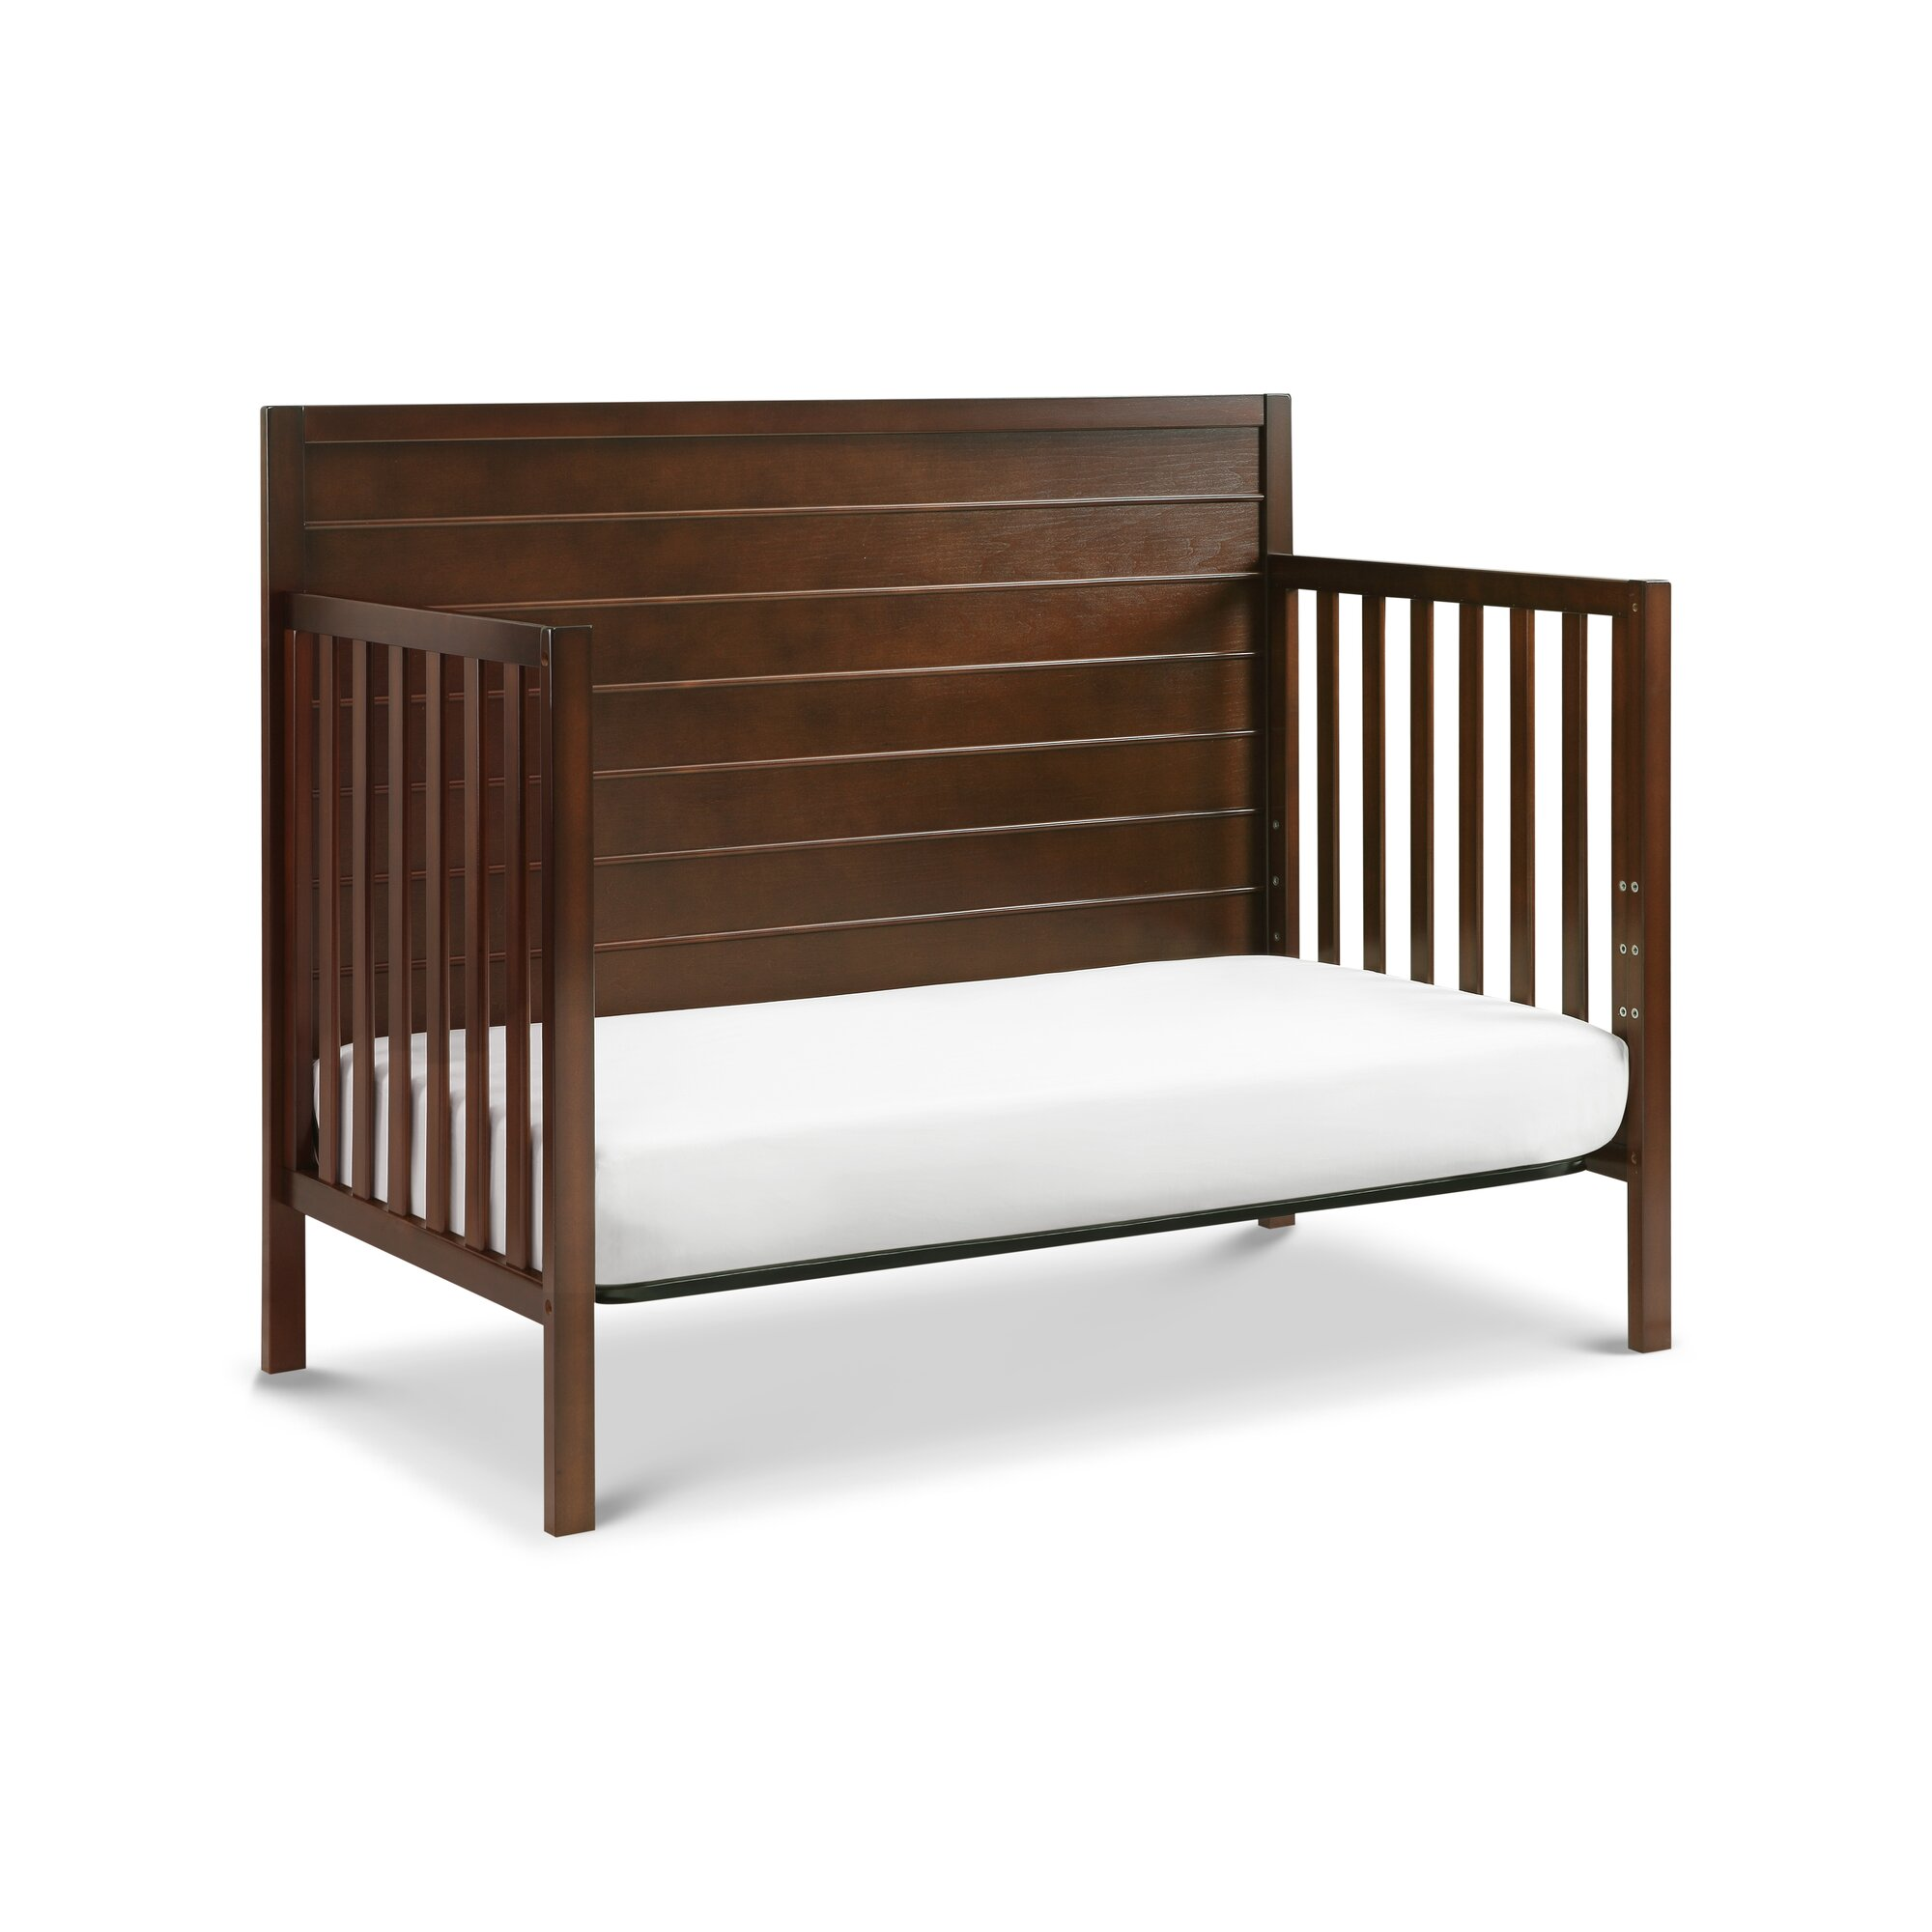 Carter S By Davinci Morgan 4 In 1 Convertible Crib